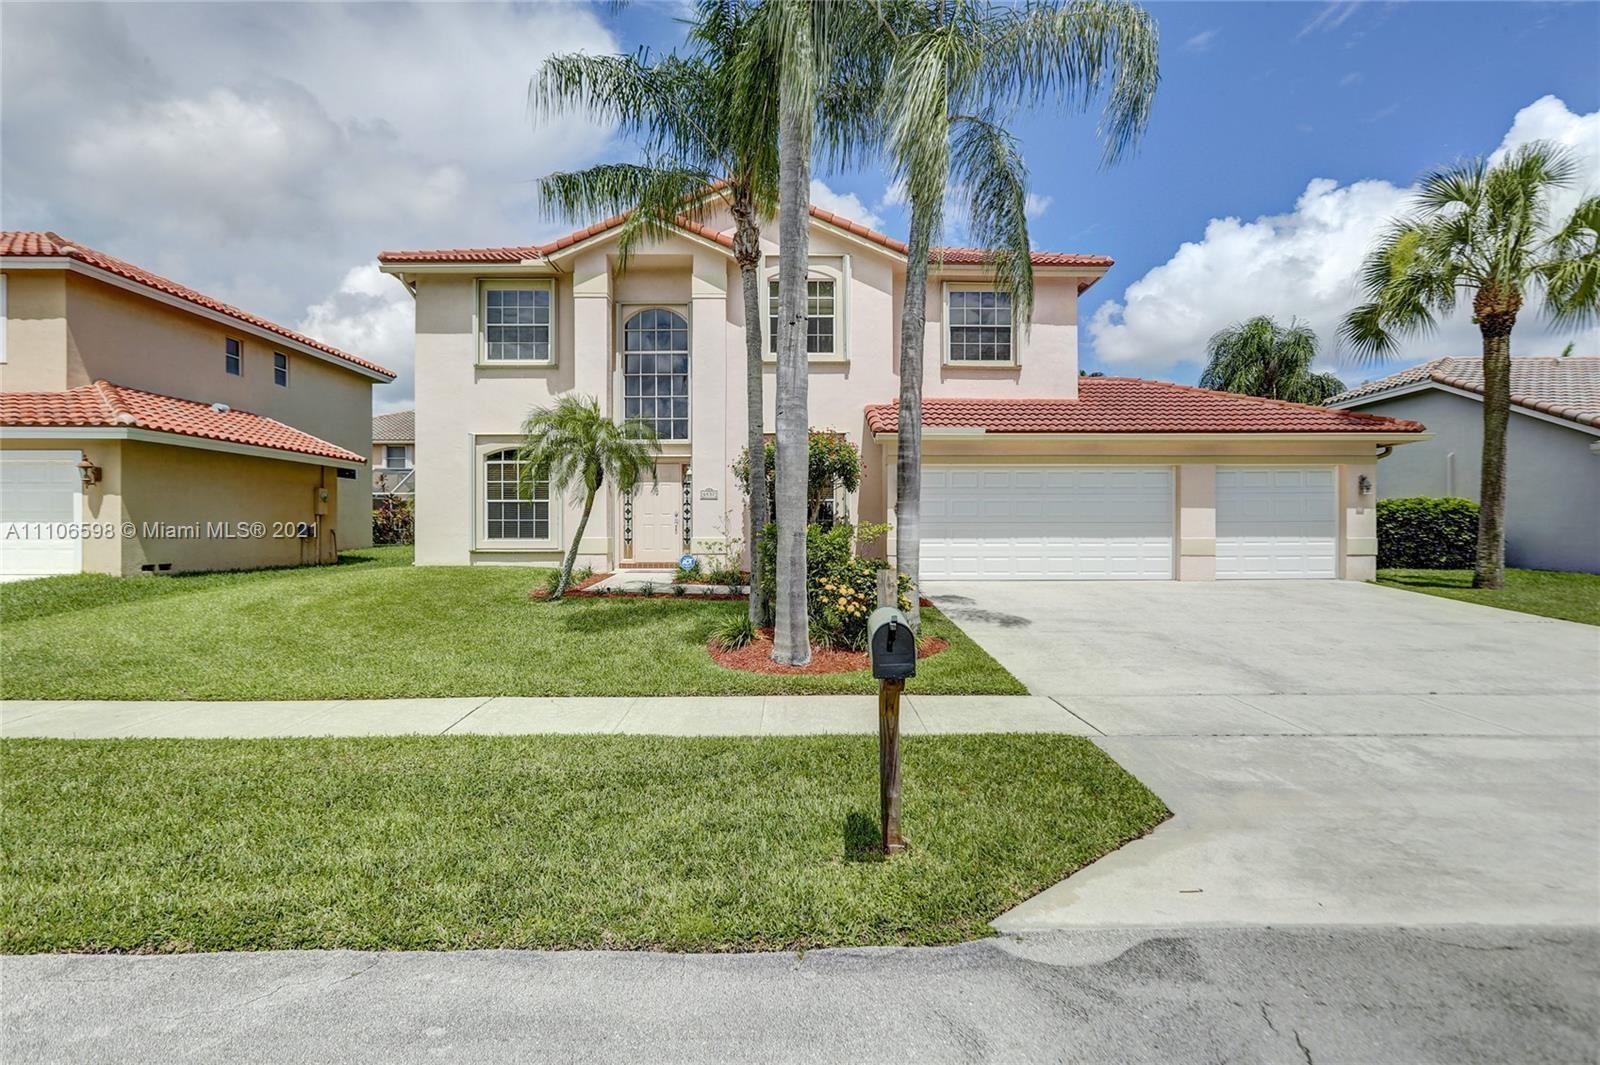 Photo of 6437 NW 54th St, Lauderhill, FL 33319 (MLS # A11106598)